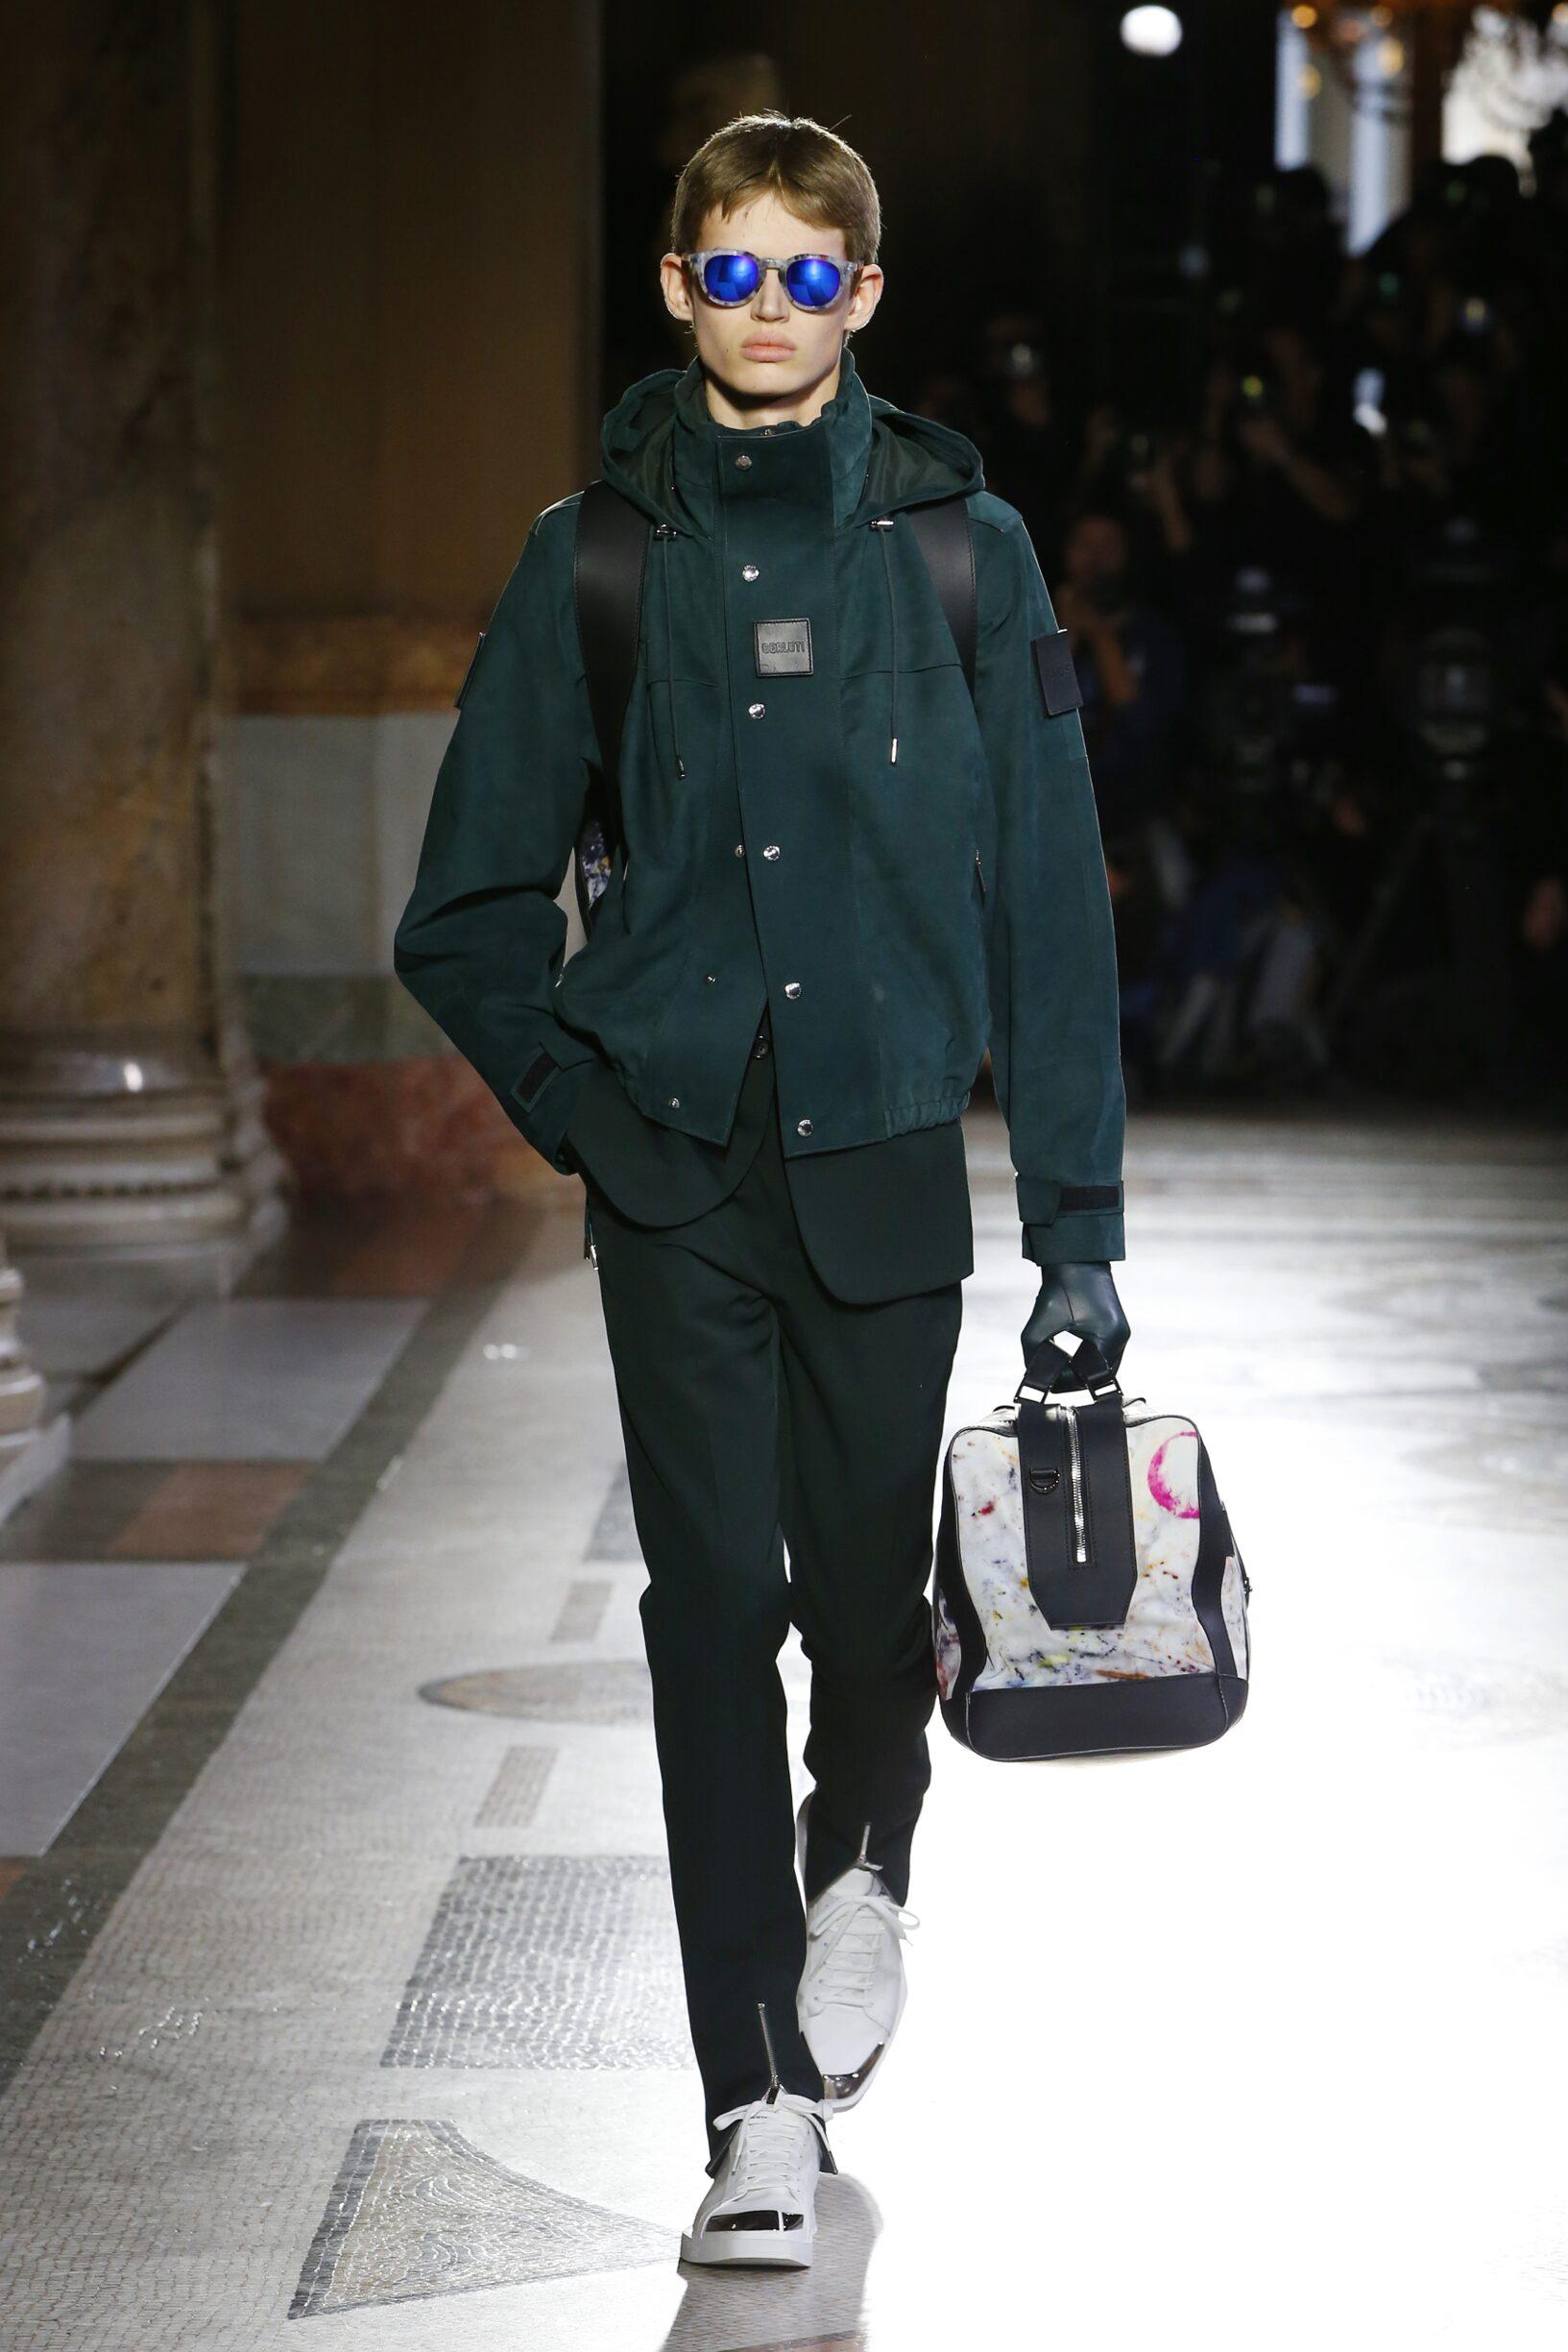 Catwalk Berluti Man Fashion Show Winter 2019